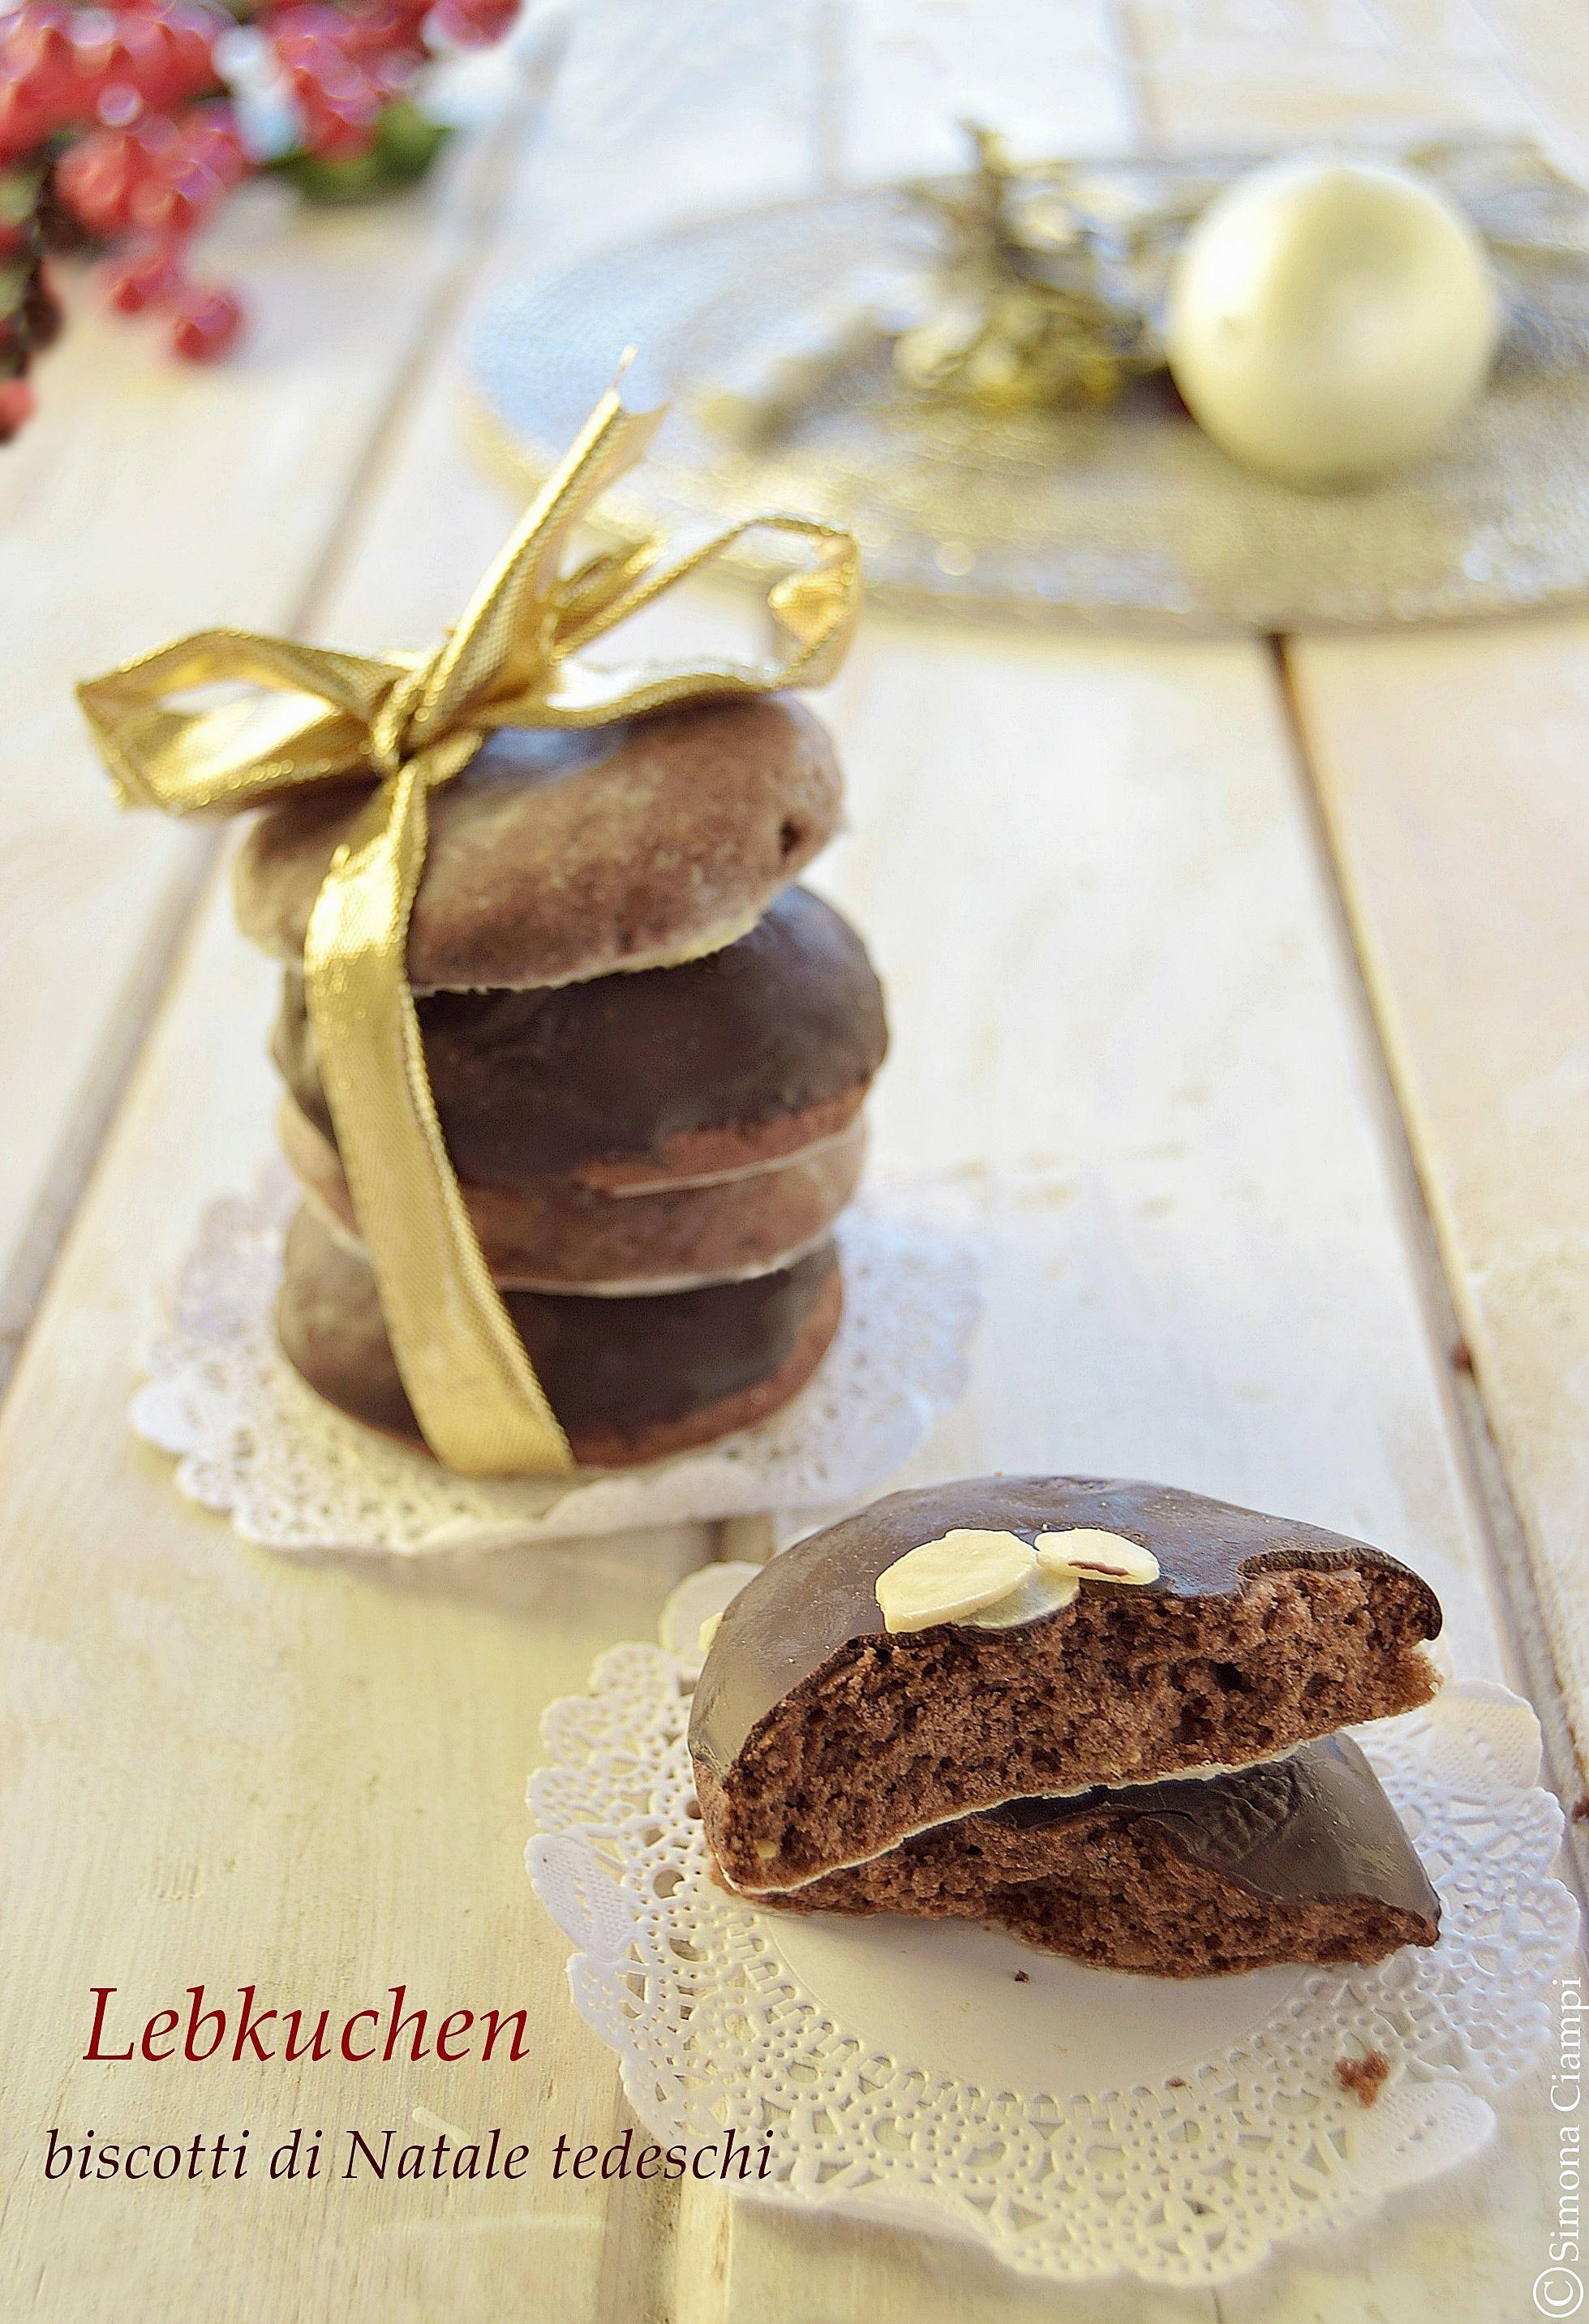 Biscotti Di Natale Tedeschi Ricetta.Lebkuchen Biscotti Di Natale Tedeschi Cukrovi Biscotti Cookies